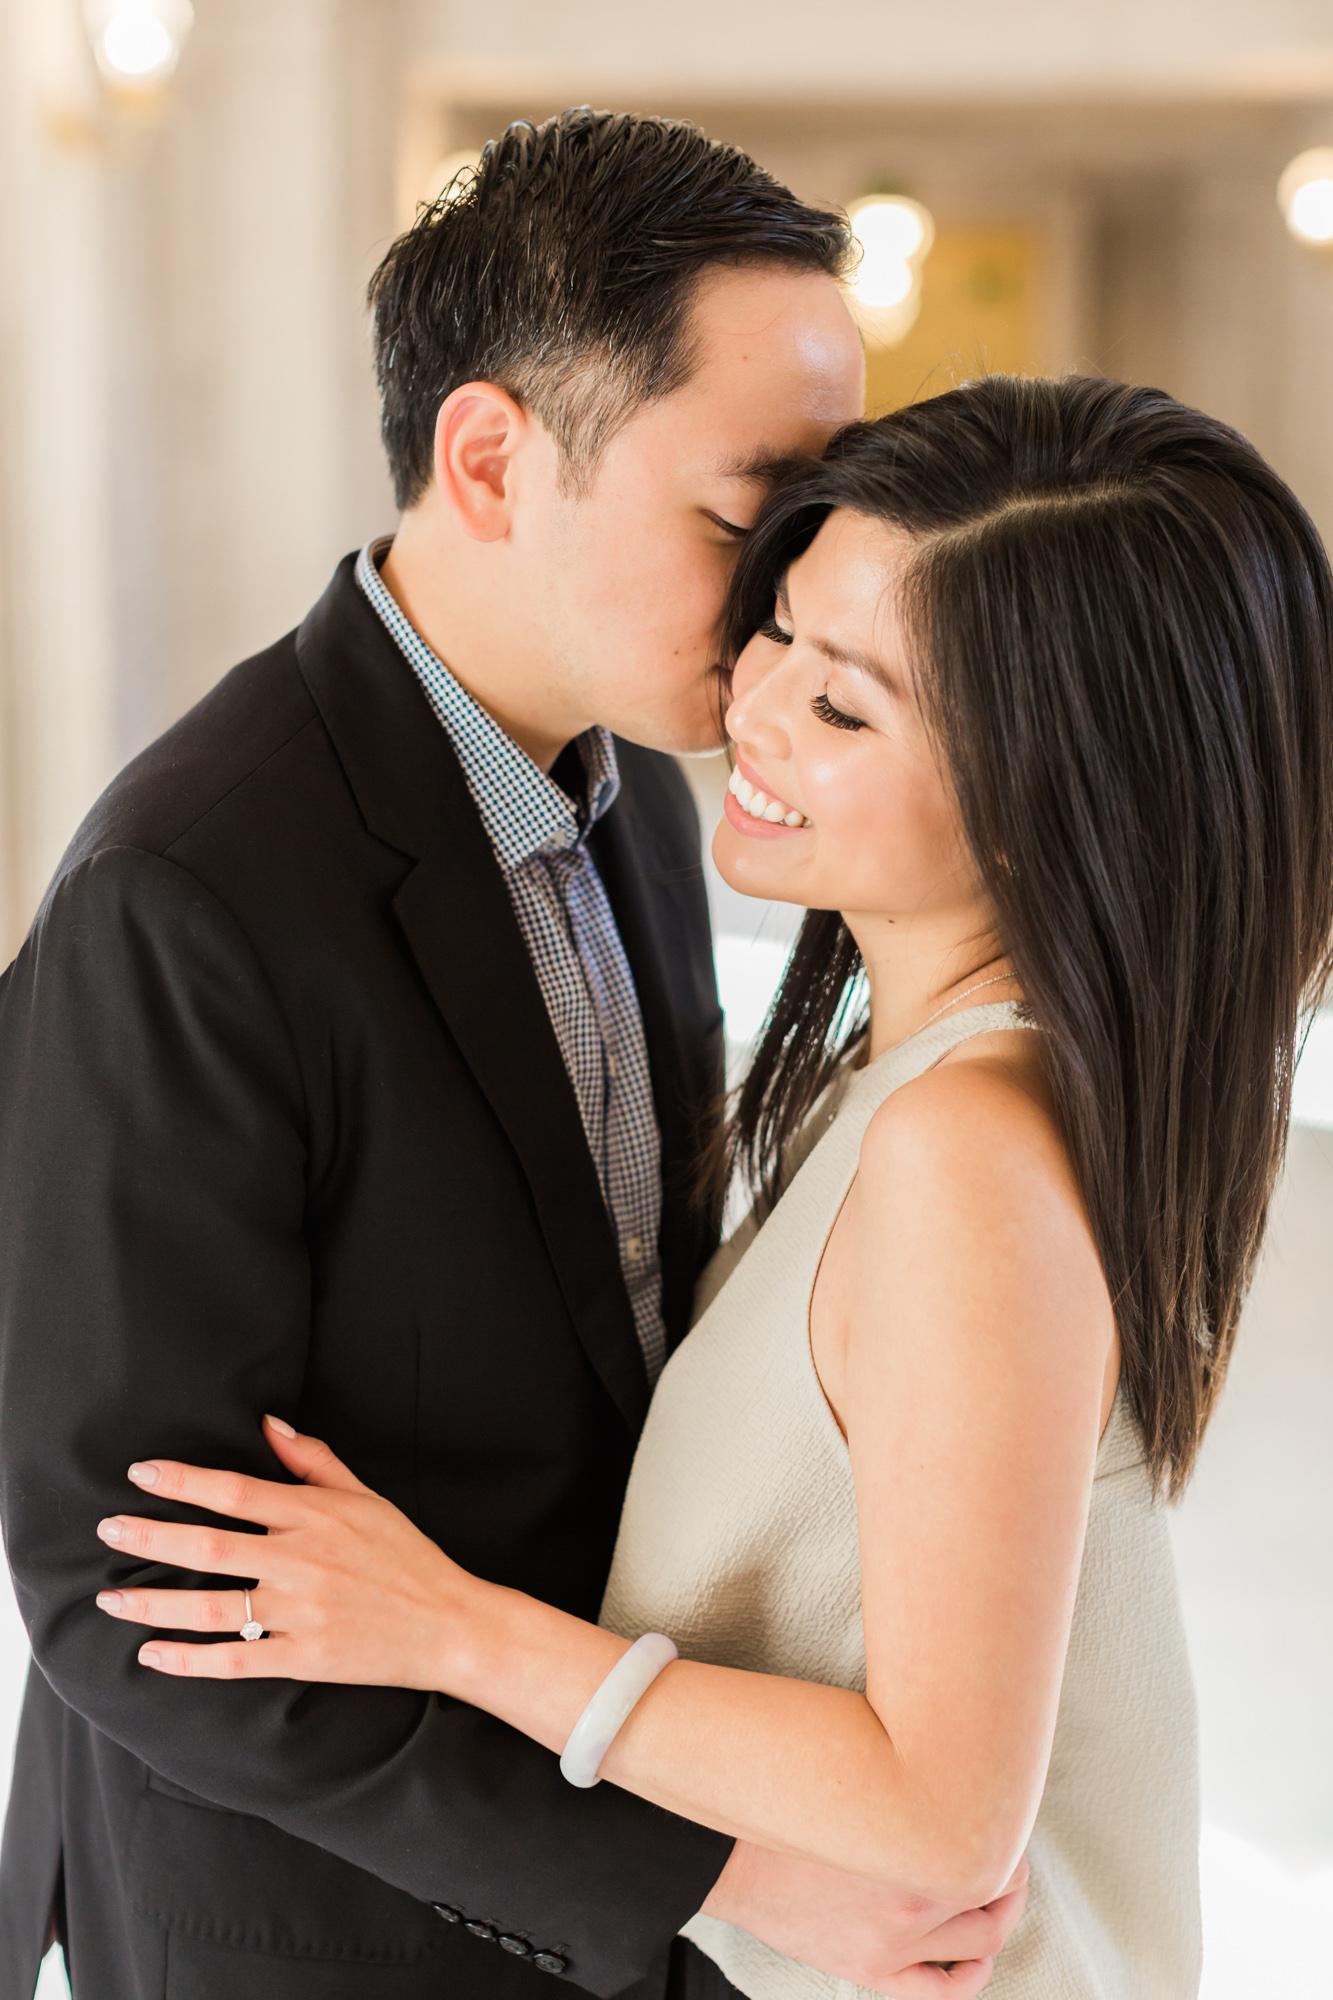 joeewong-jaal-california-san-francisco-engagement-10